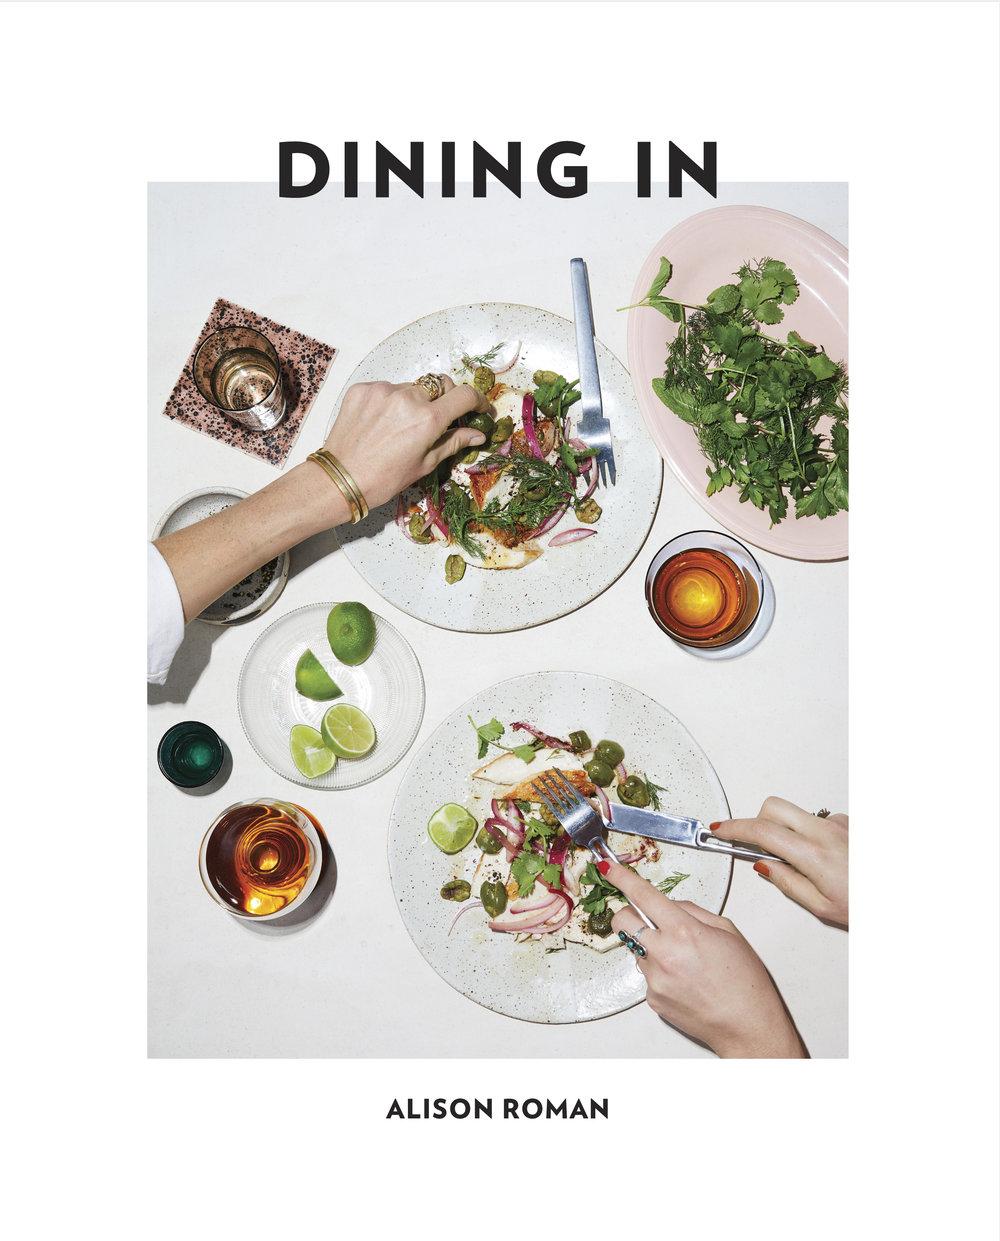 DiningIn_cover.jpg